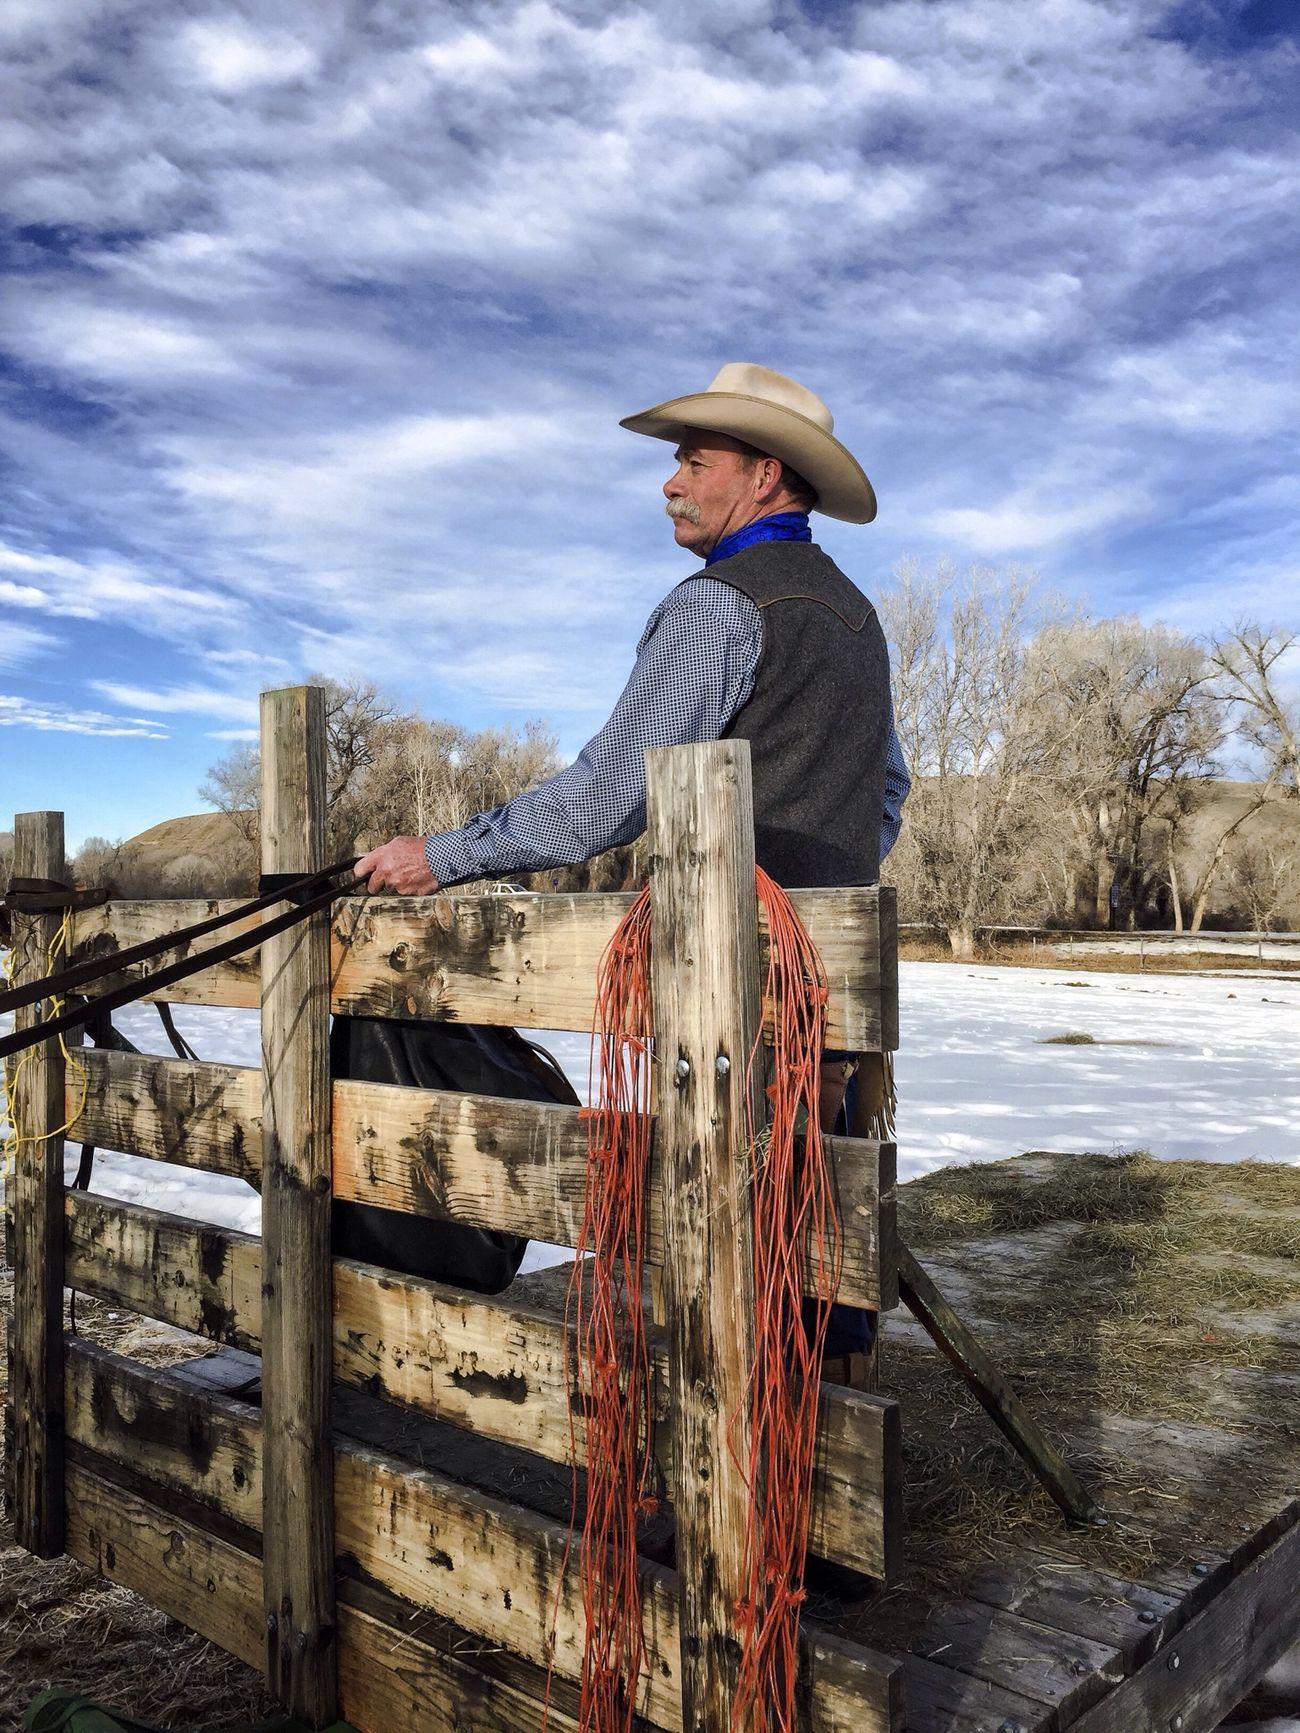 Beautiful stock photos of cowboy, 54-59 Years, Active Seniors, Caucasian Ethnicity, Cloud - Sky